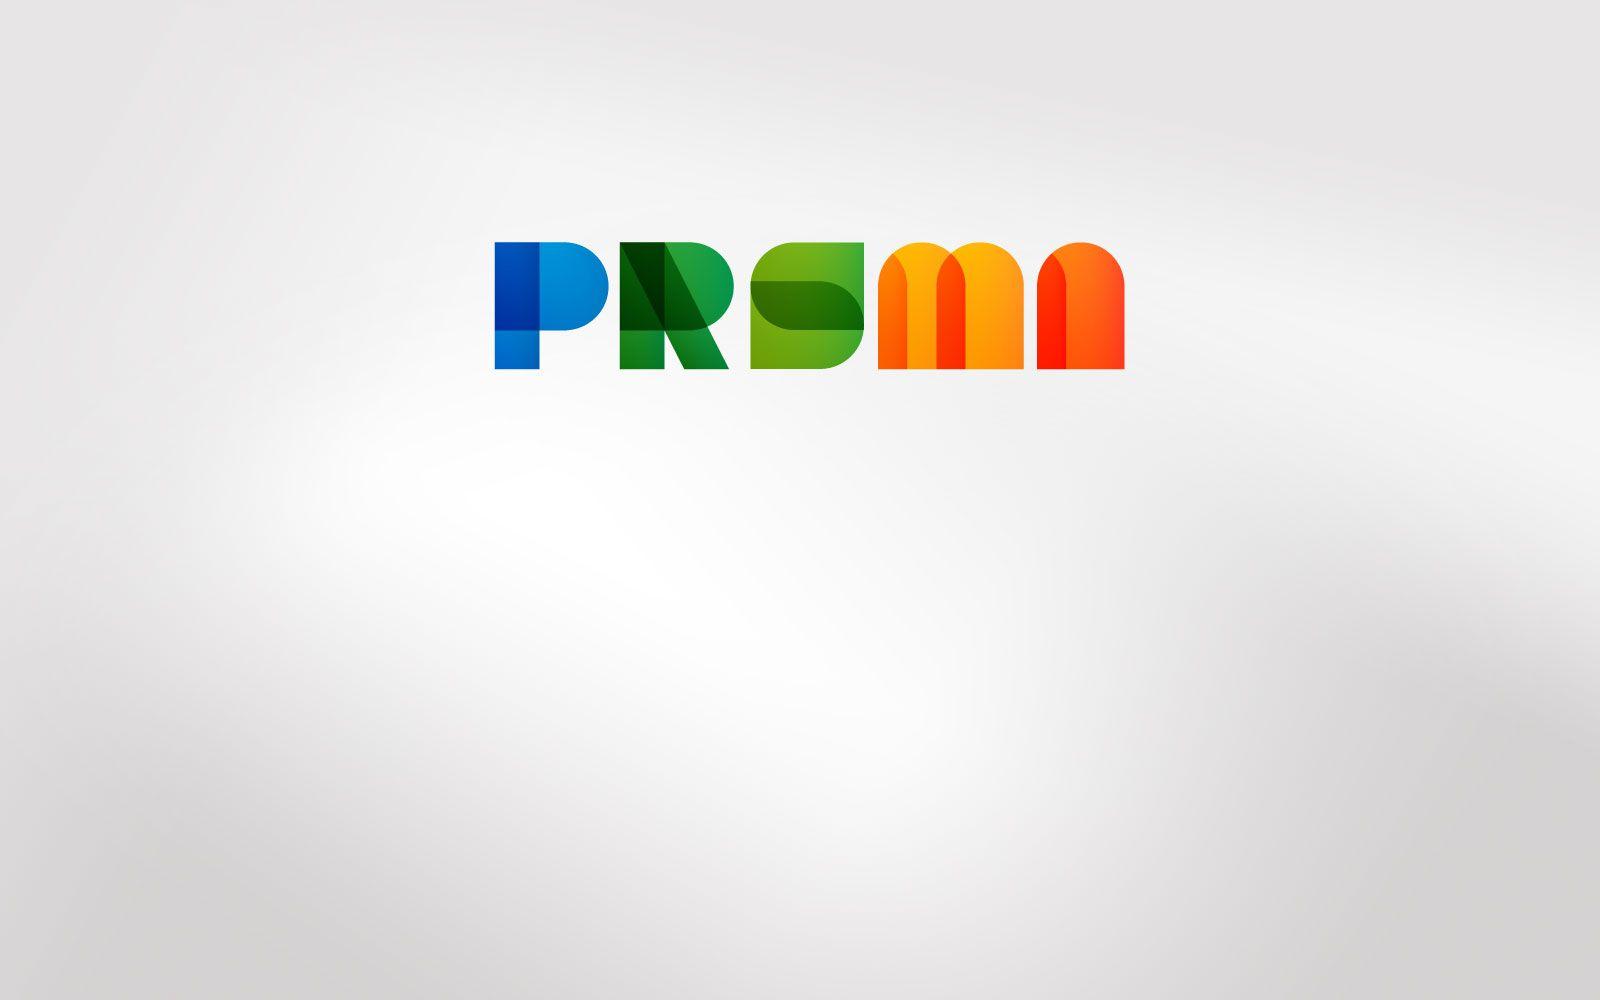 PRSMA   logotipo  